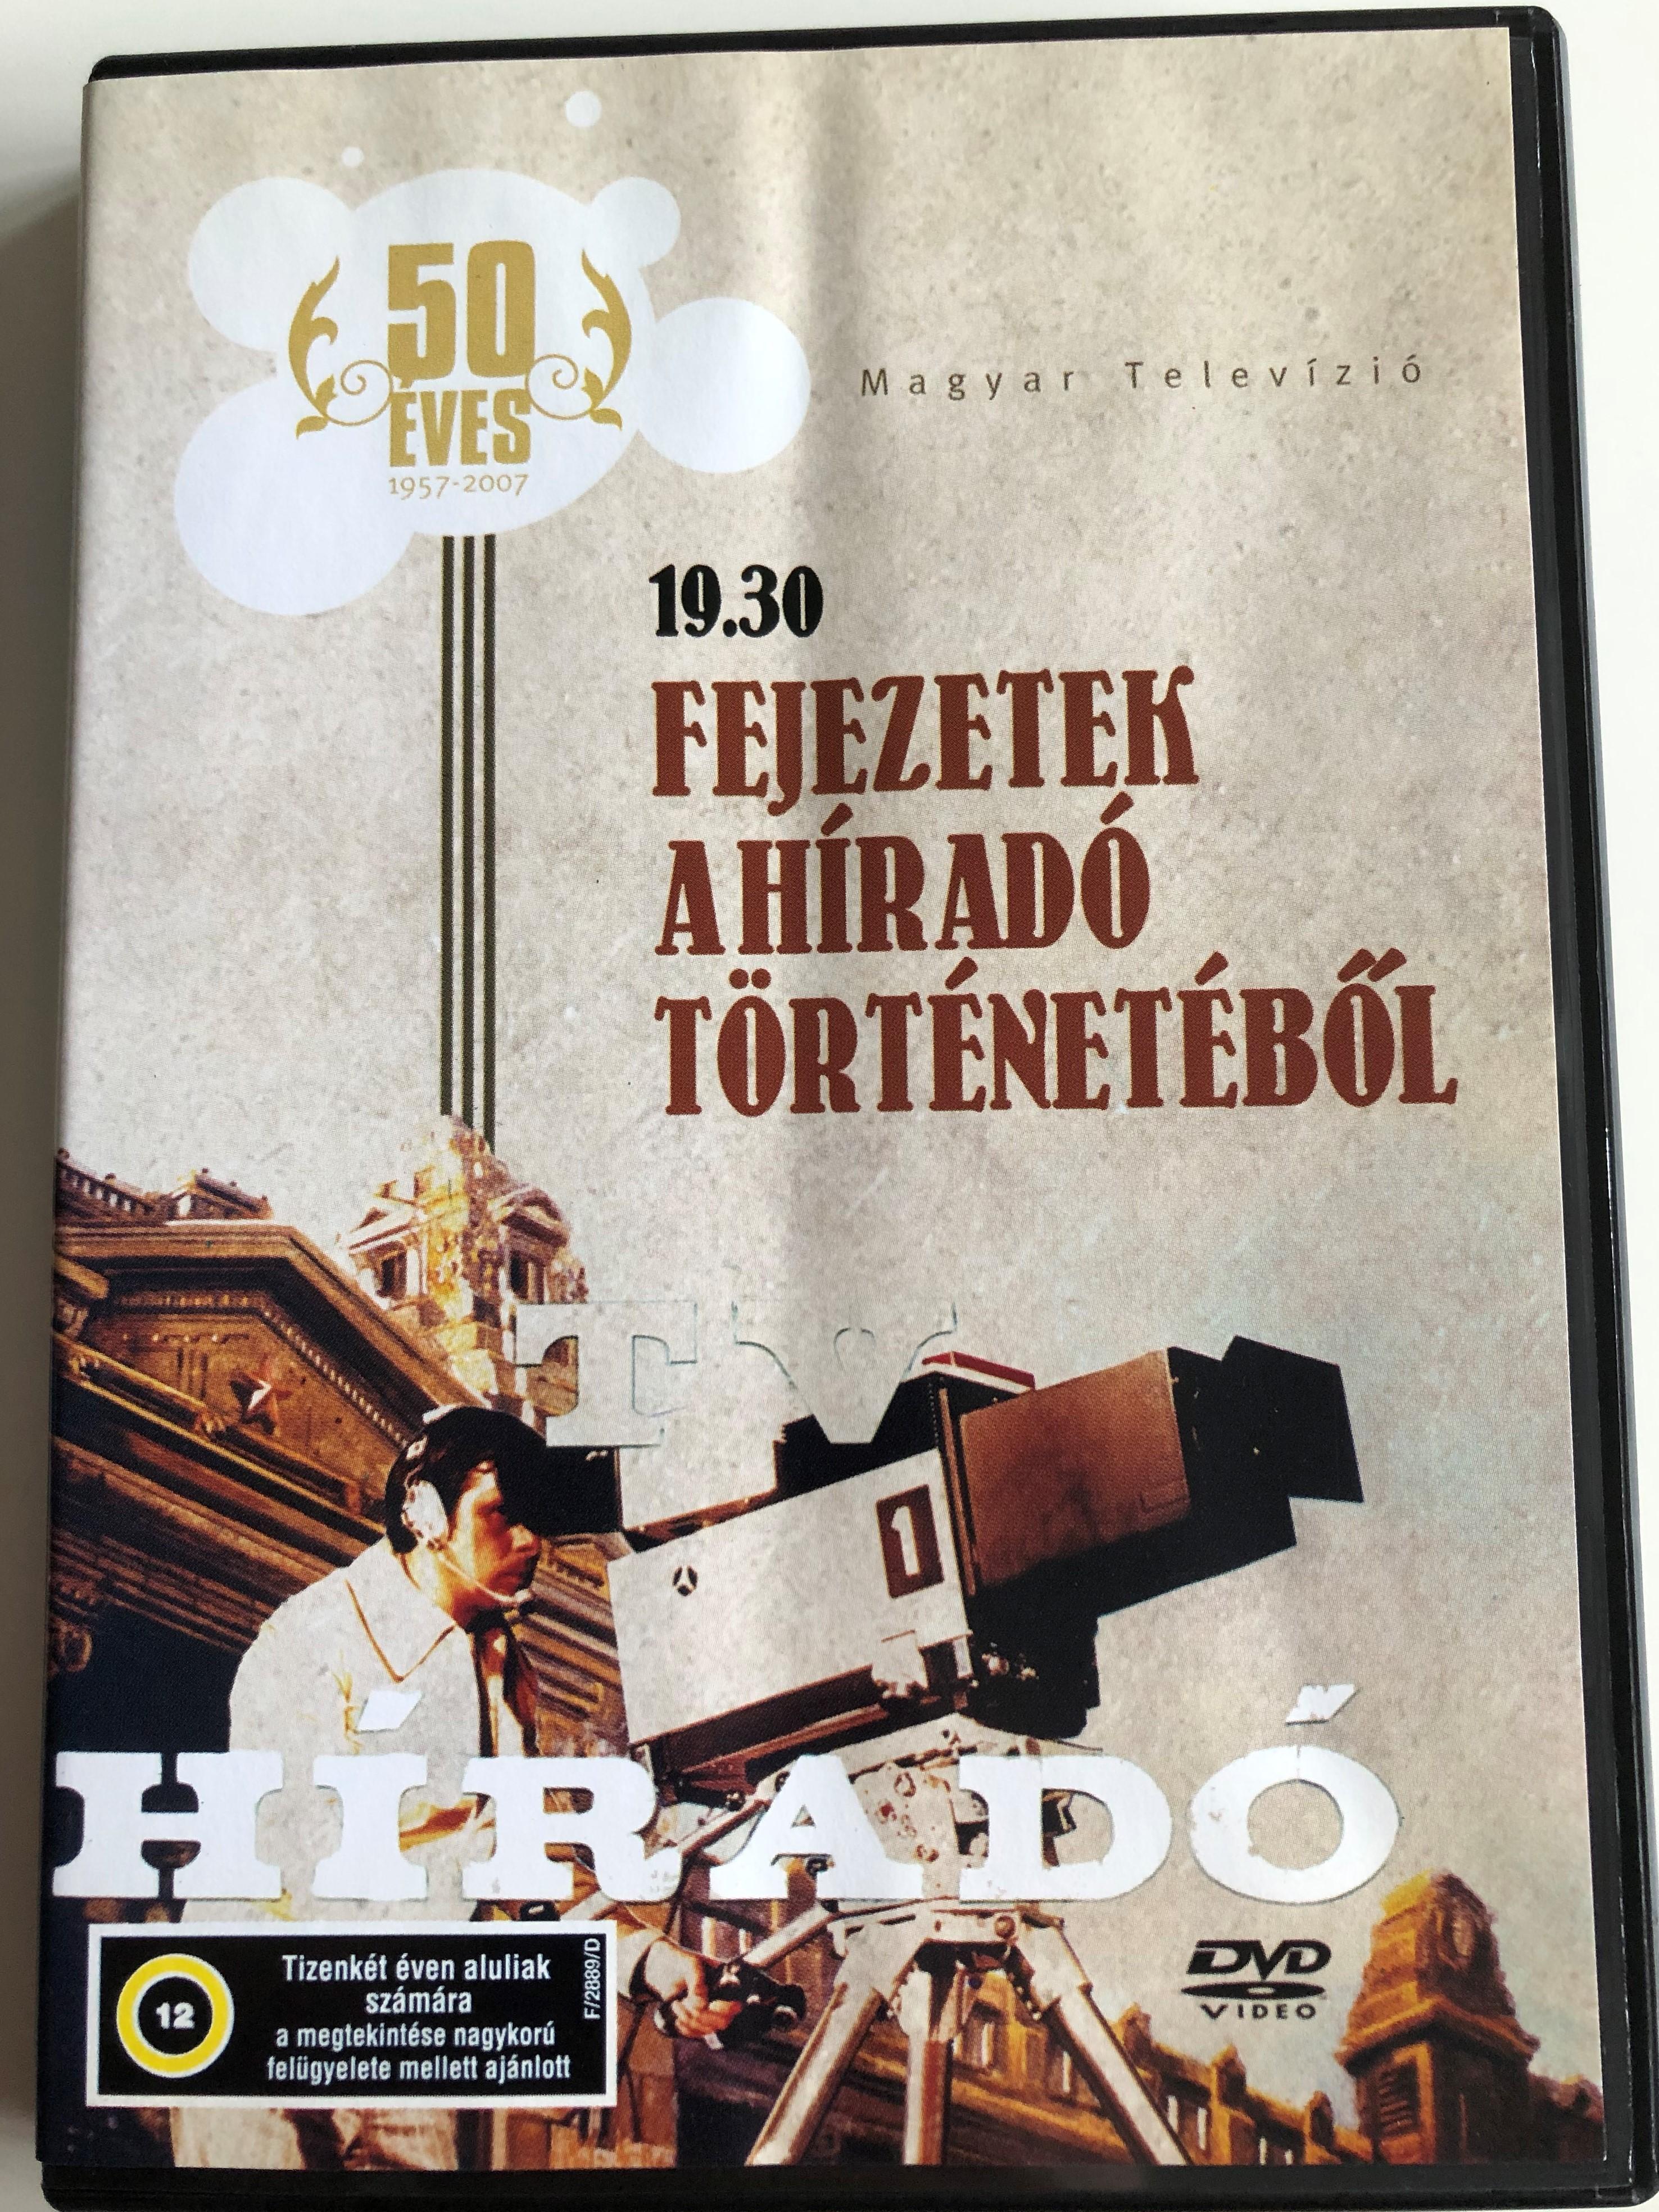 magyar-telev-zi-19.30-fejezetek-a-h-rad-t-rt-net-b-l-dvd-1.jpg